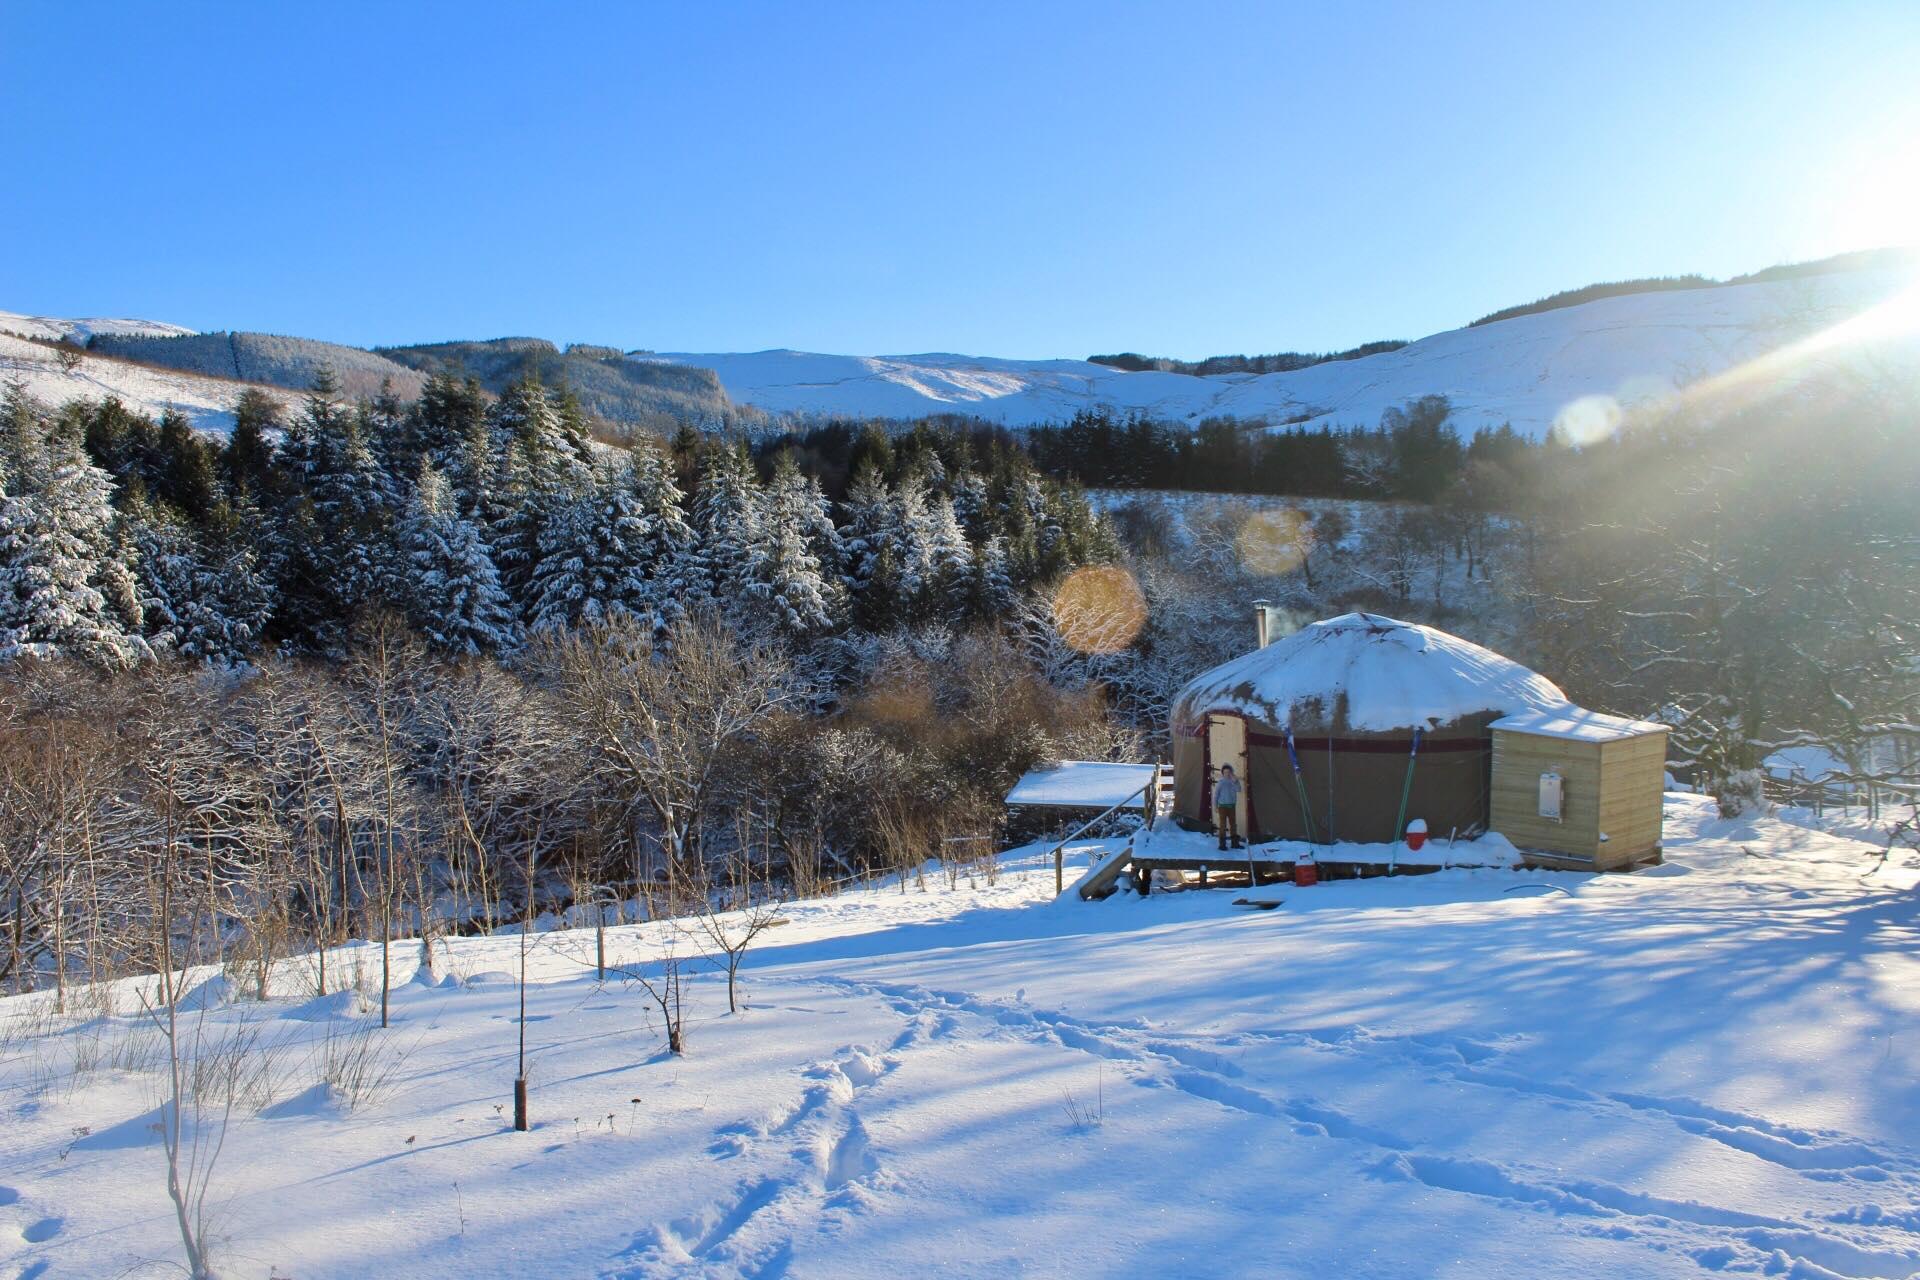 22' Yurt for the Wonderful Wheeler Family, Powys